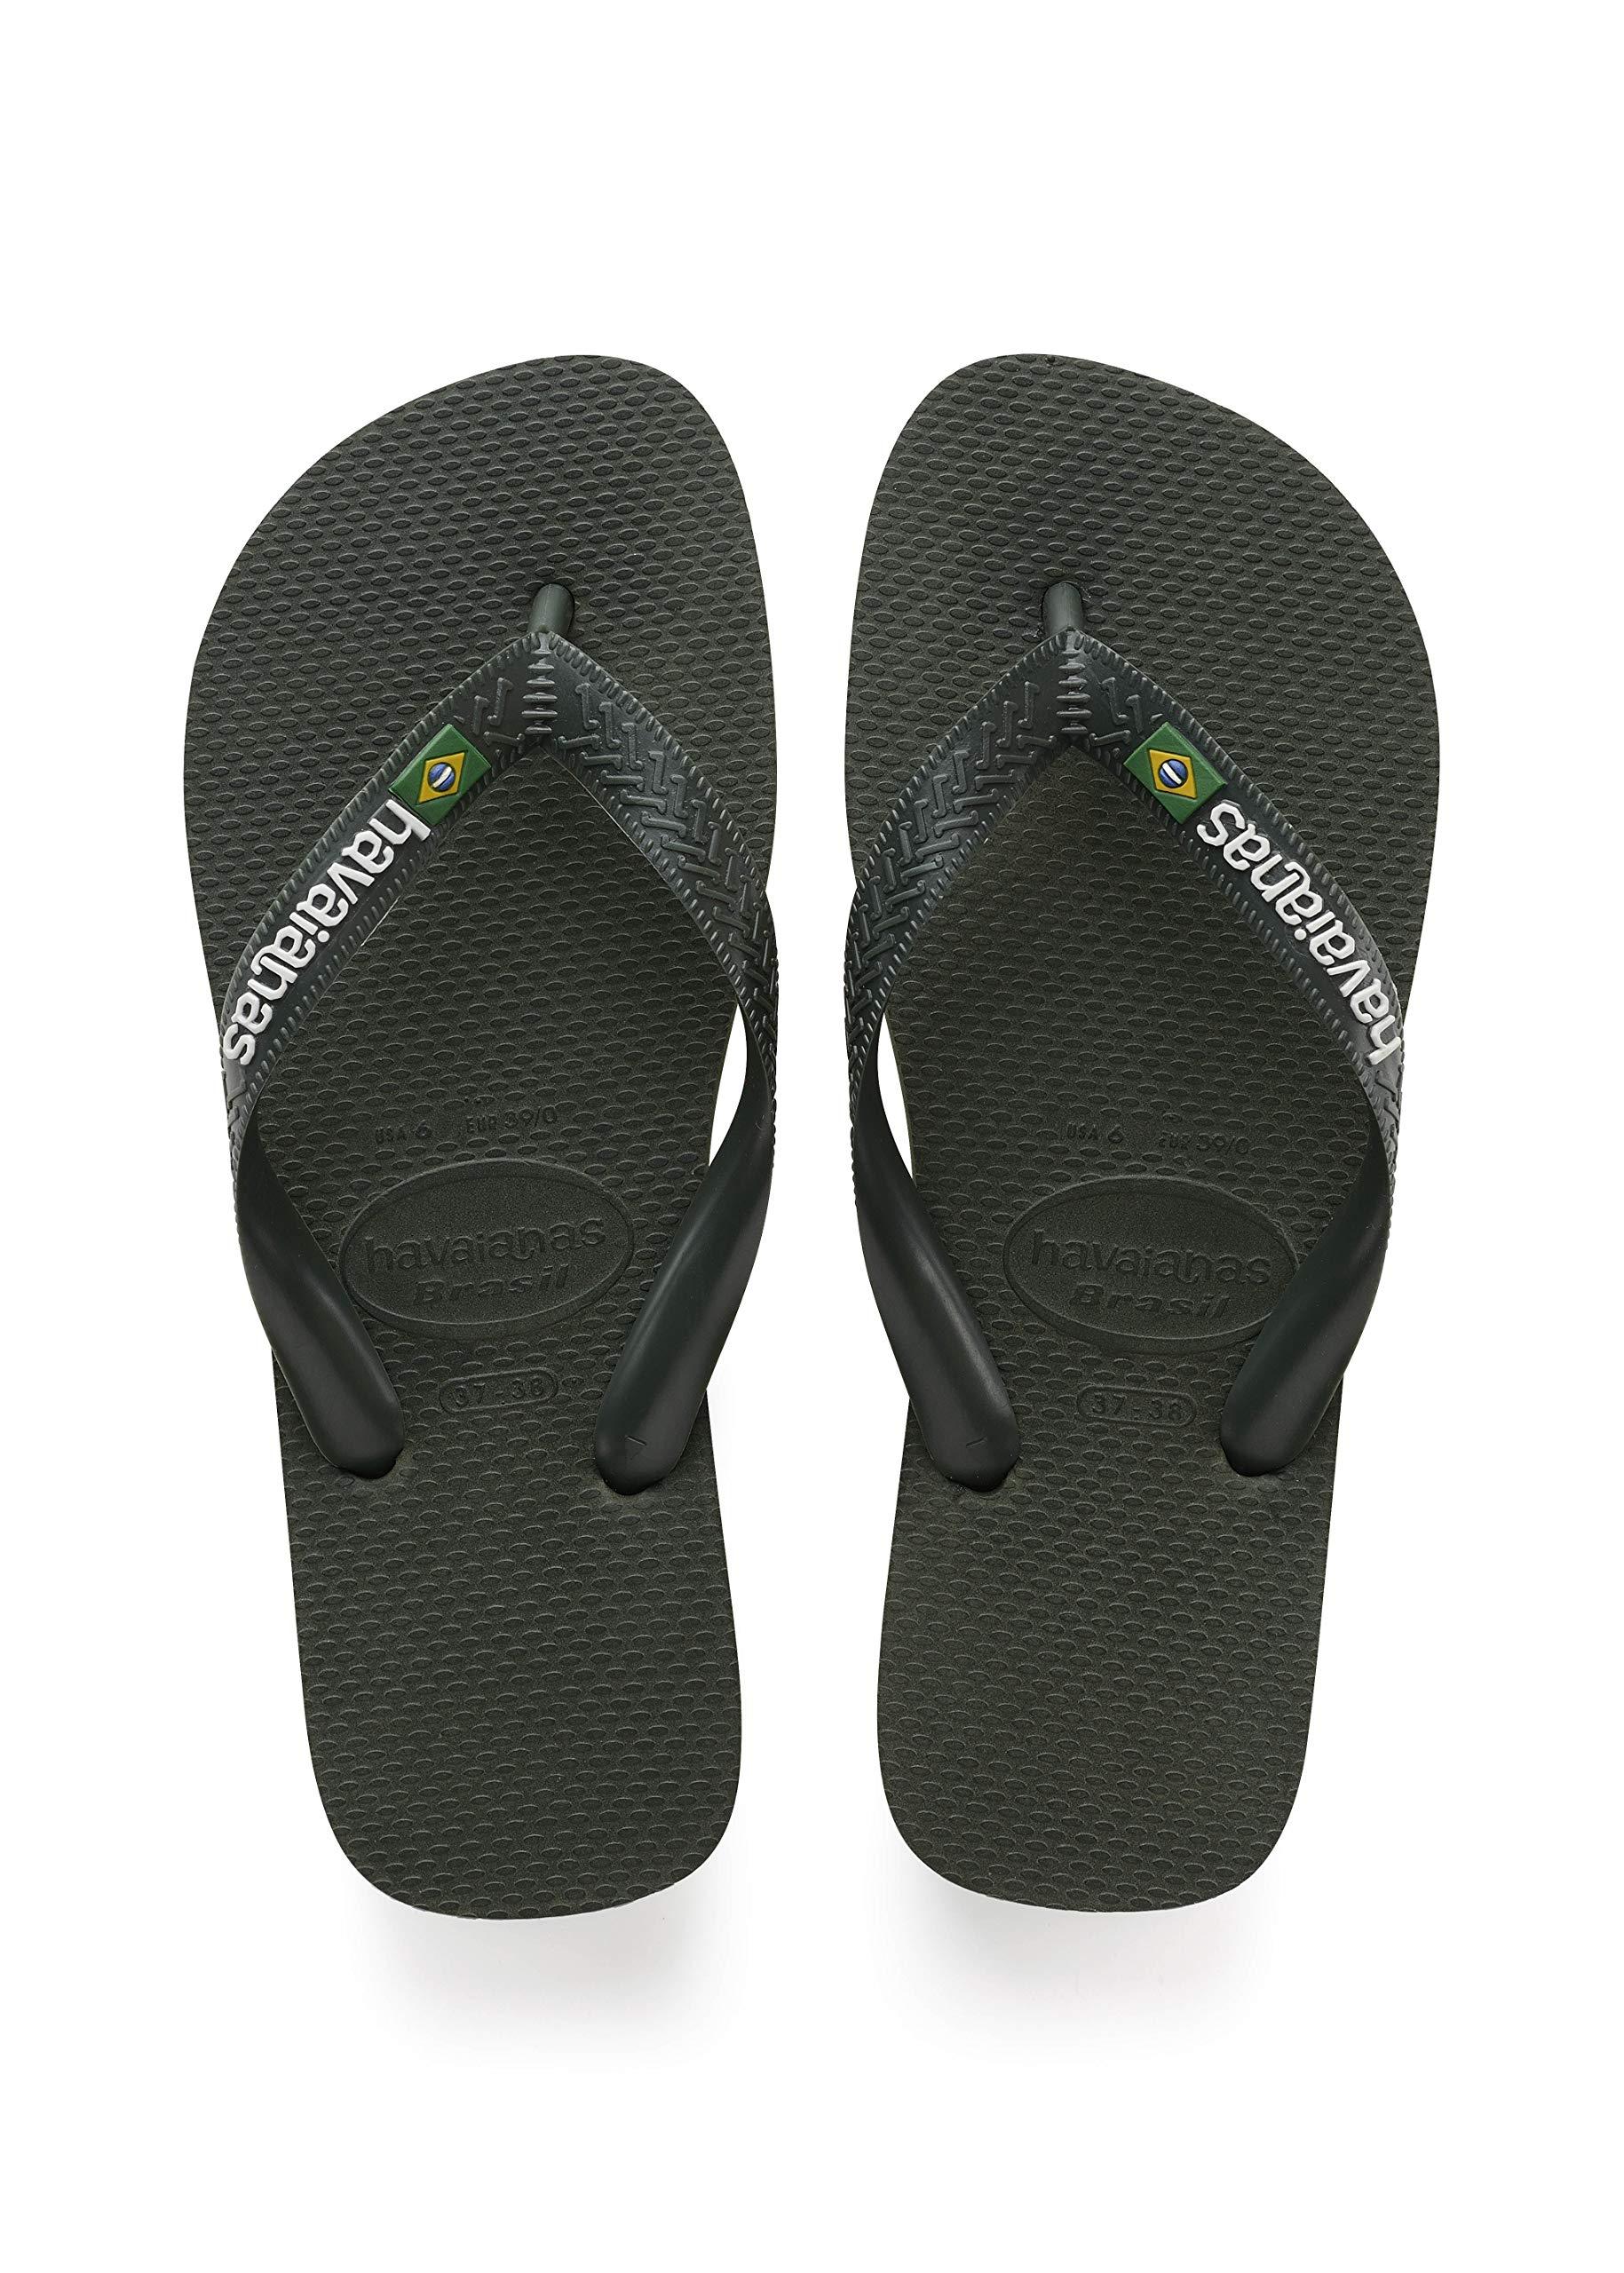 c0cd2340dae5 Galleon - Havaianas Unisex Adults  Brasil Logo Flip Flops